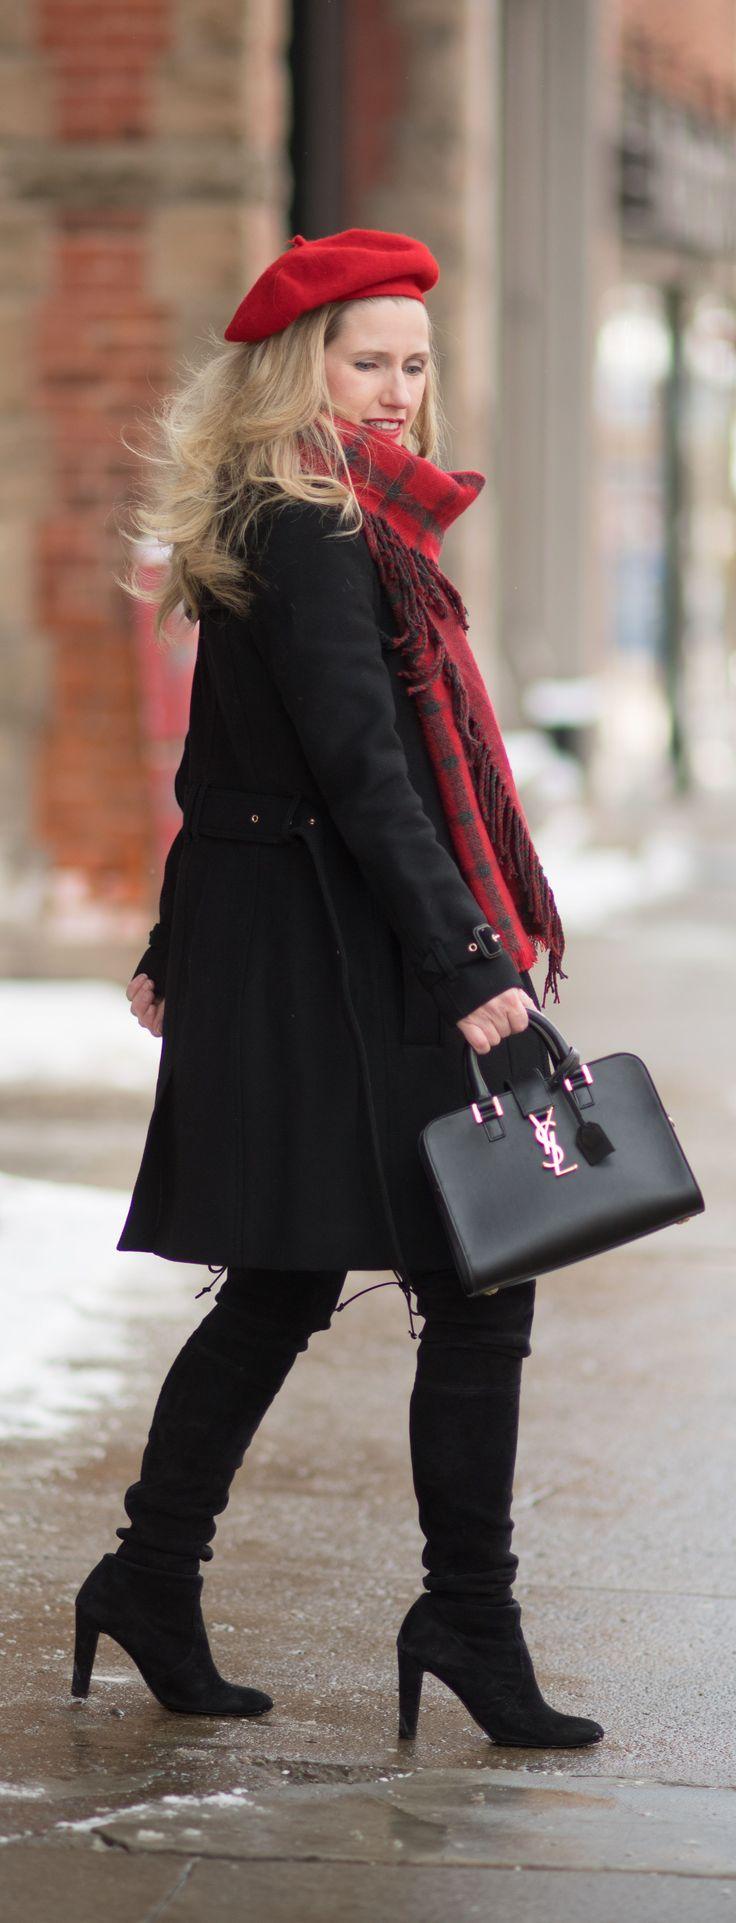 Petite Fashion and Style Blog | Fashion for Petite Women | Burberry Gibbsmore Wool Coat | Aqua Pieced Side Fringe Scarf | Stuart Weitzman Hiline Boots | Wool Beret | Winter Wardrobe Essentials #petitefashion #fashionover40 #winterfashion